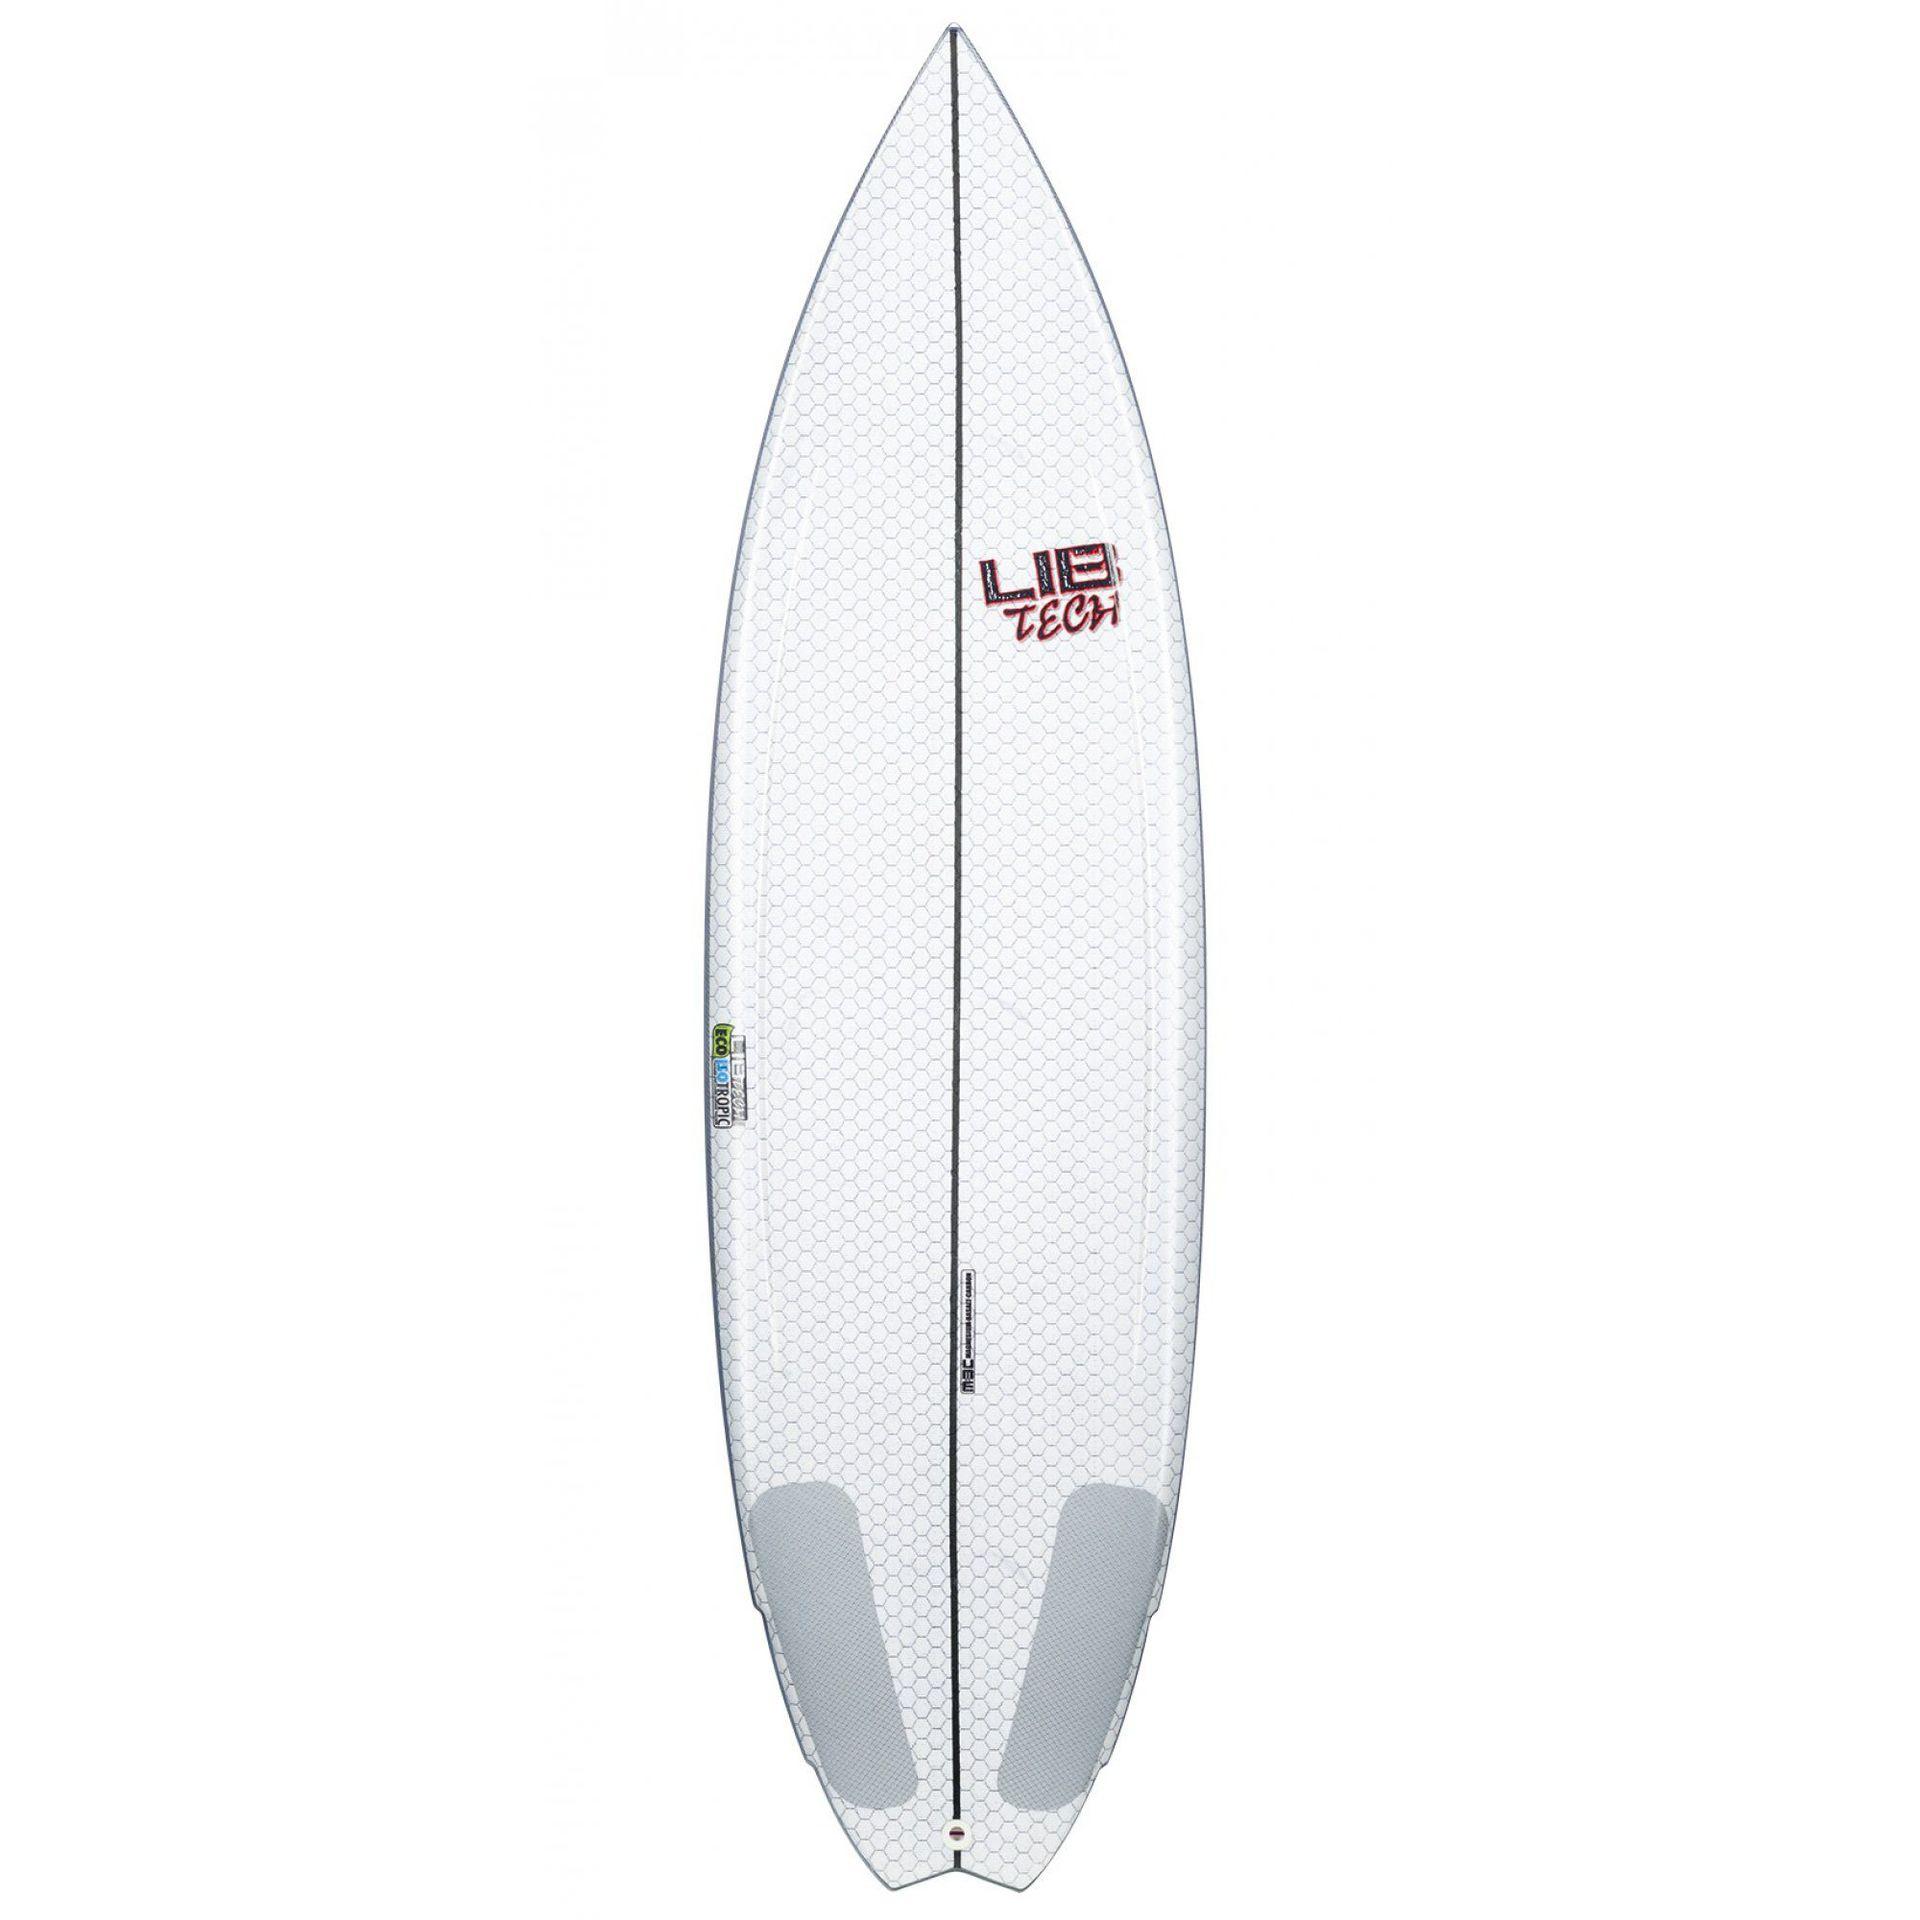 DESKA SURFINGOWA LIB TECH RINGER 1